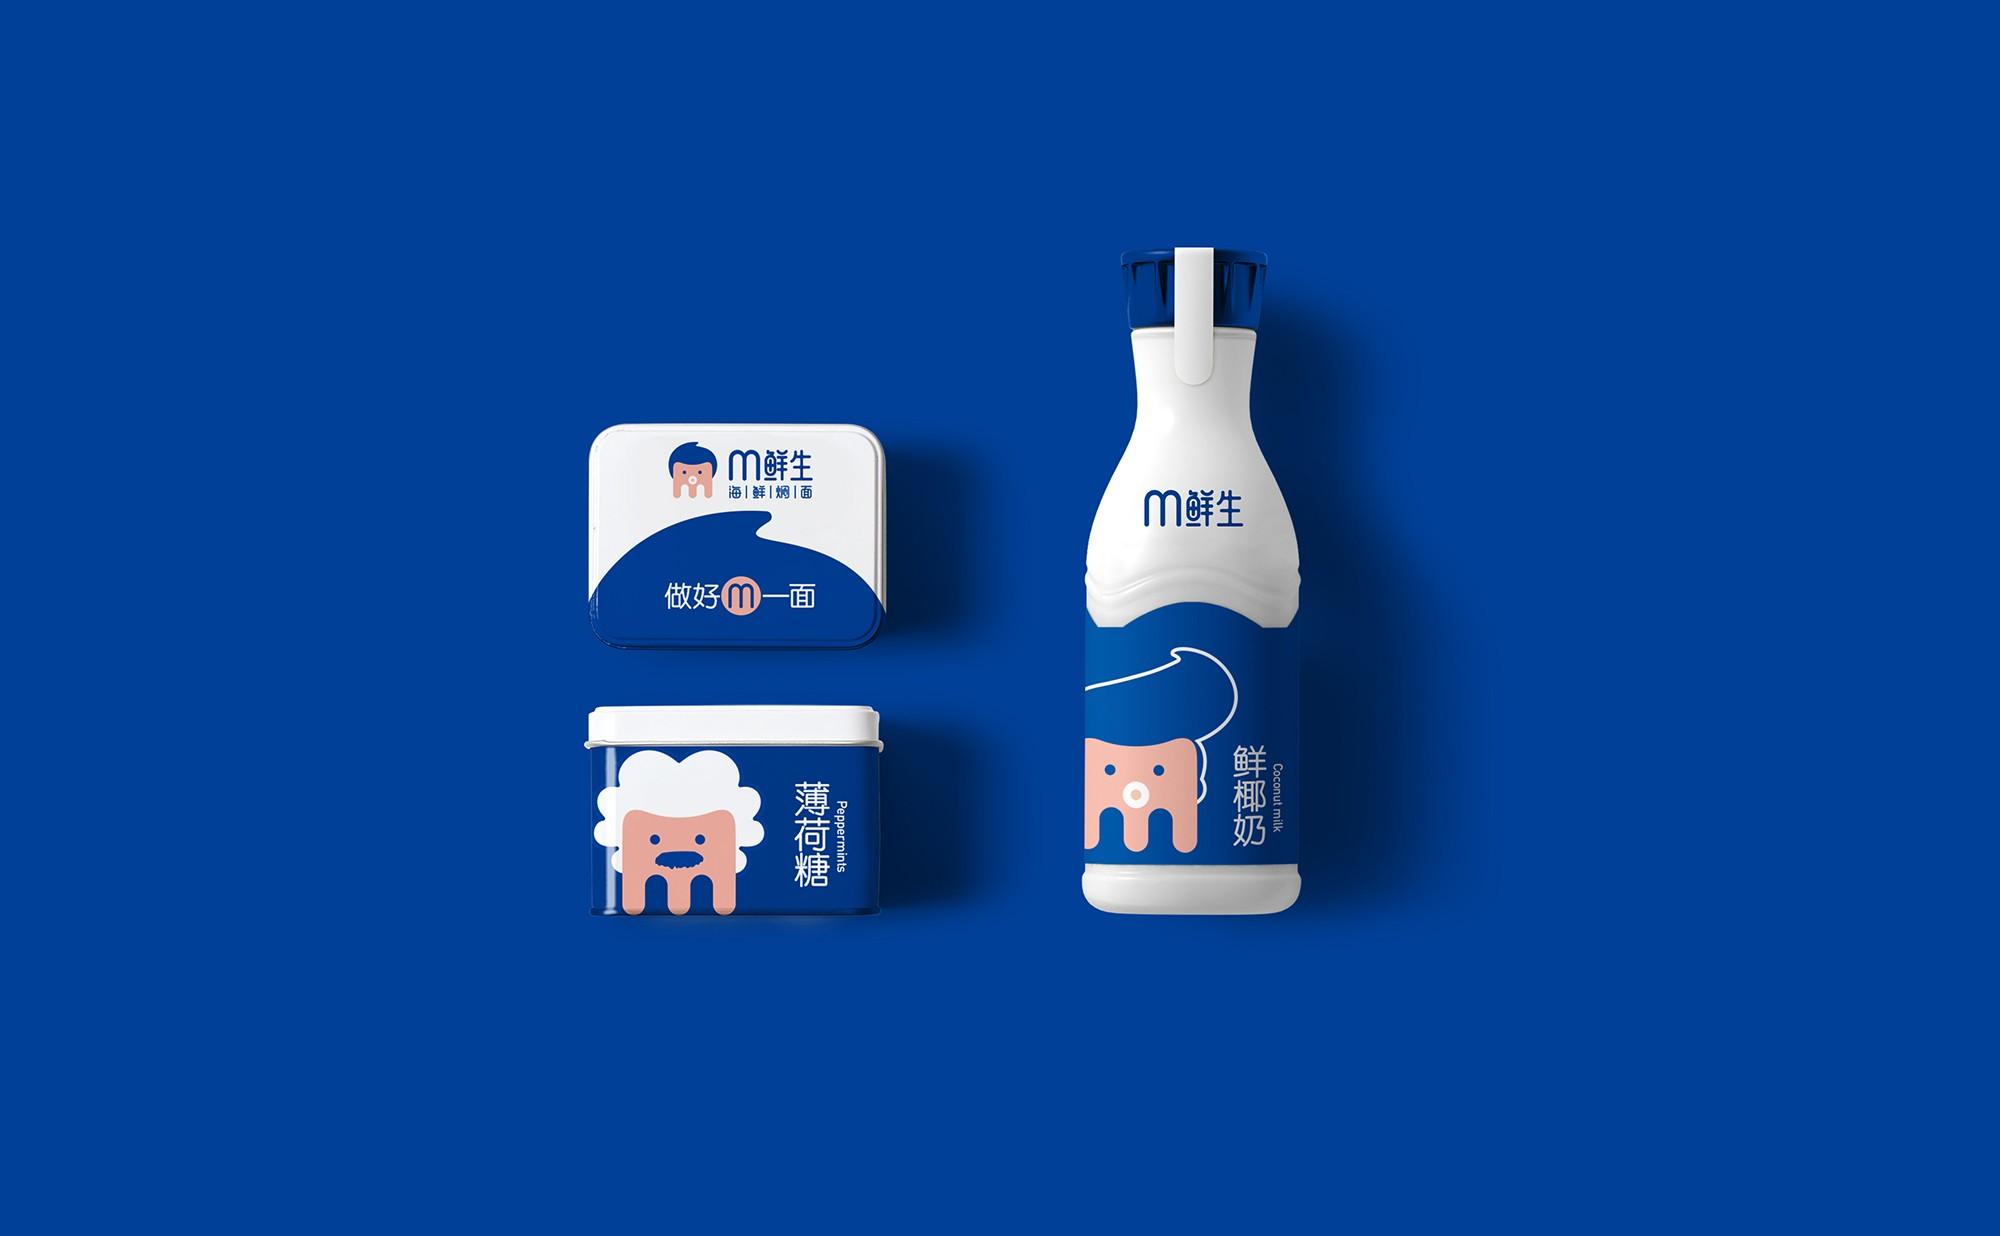 M鲜生海鲜焖面品牌形象设计-5